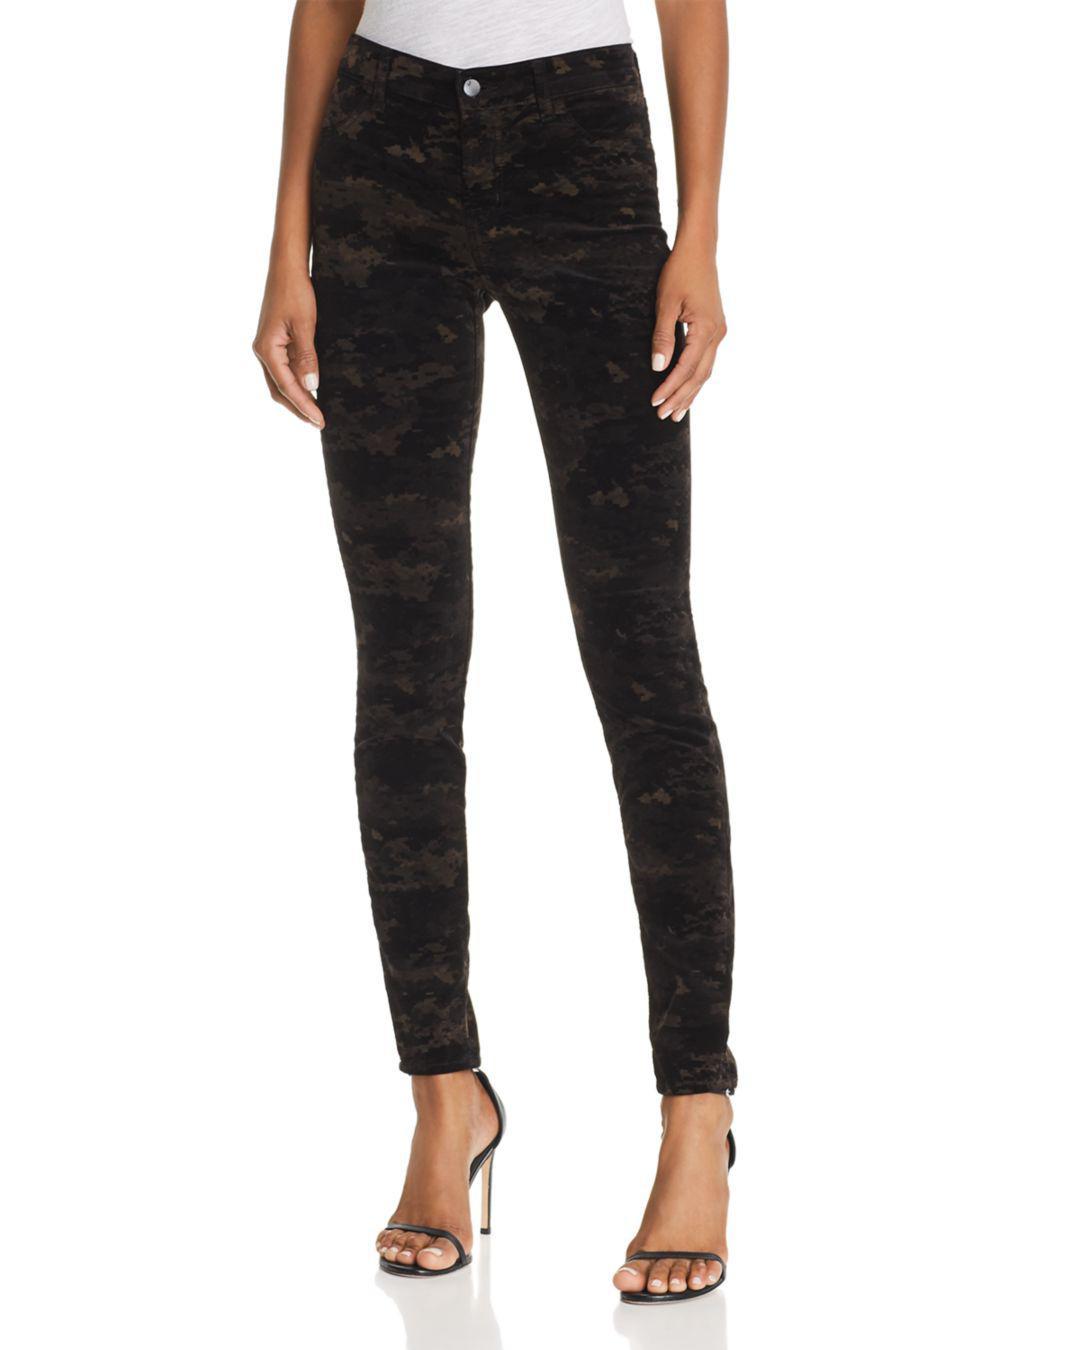 cf46f9c06a4d0 Lyst - J Brand 815 Mid Rise Super Skinny Jeans In Camo Velvet in Black